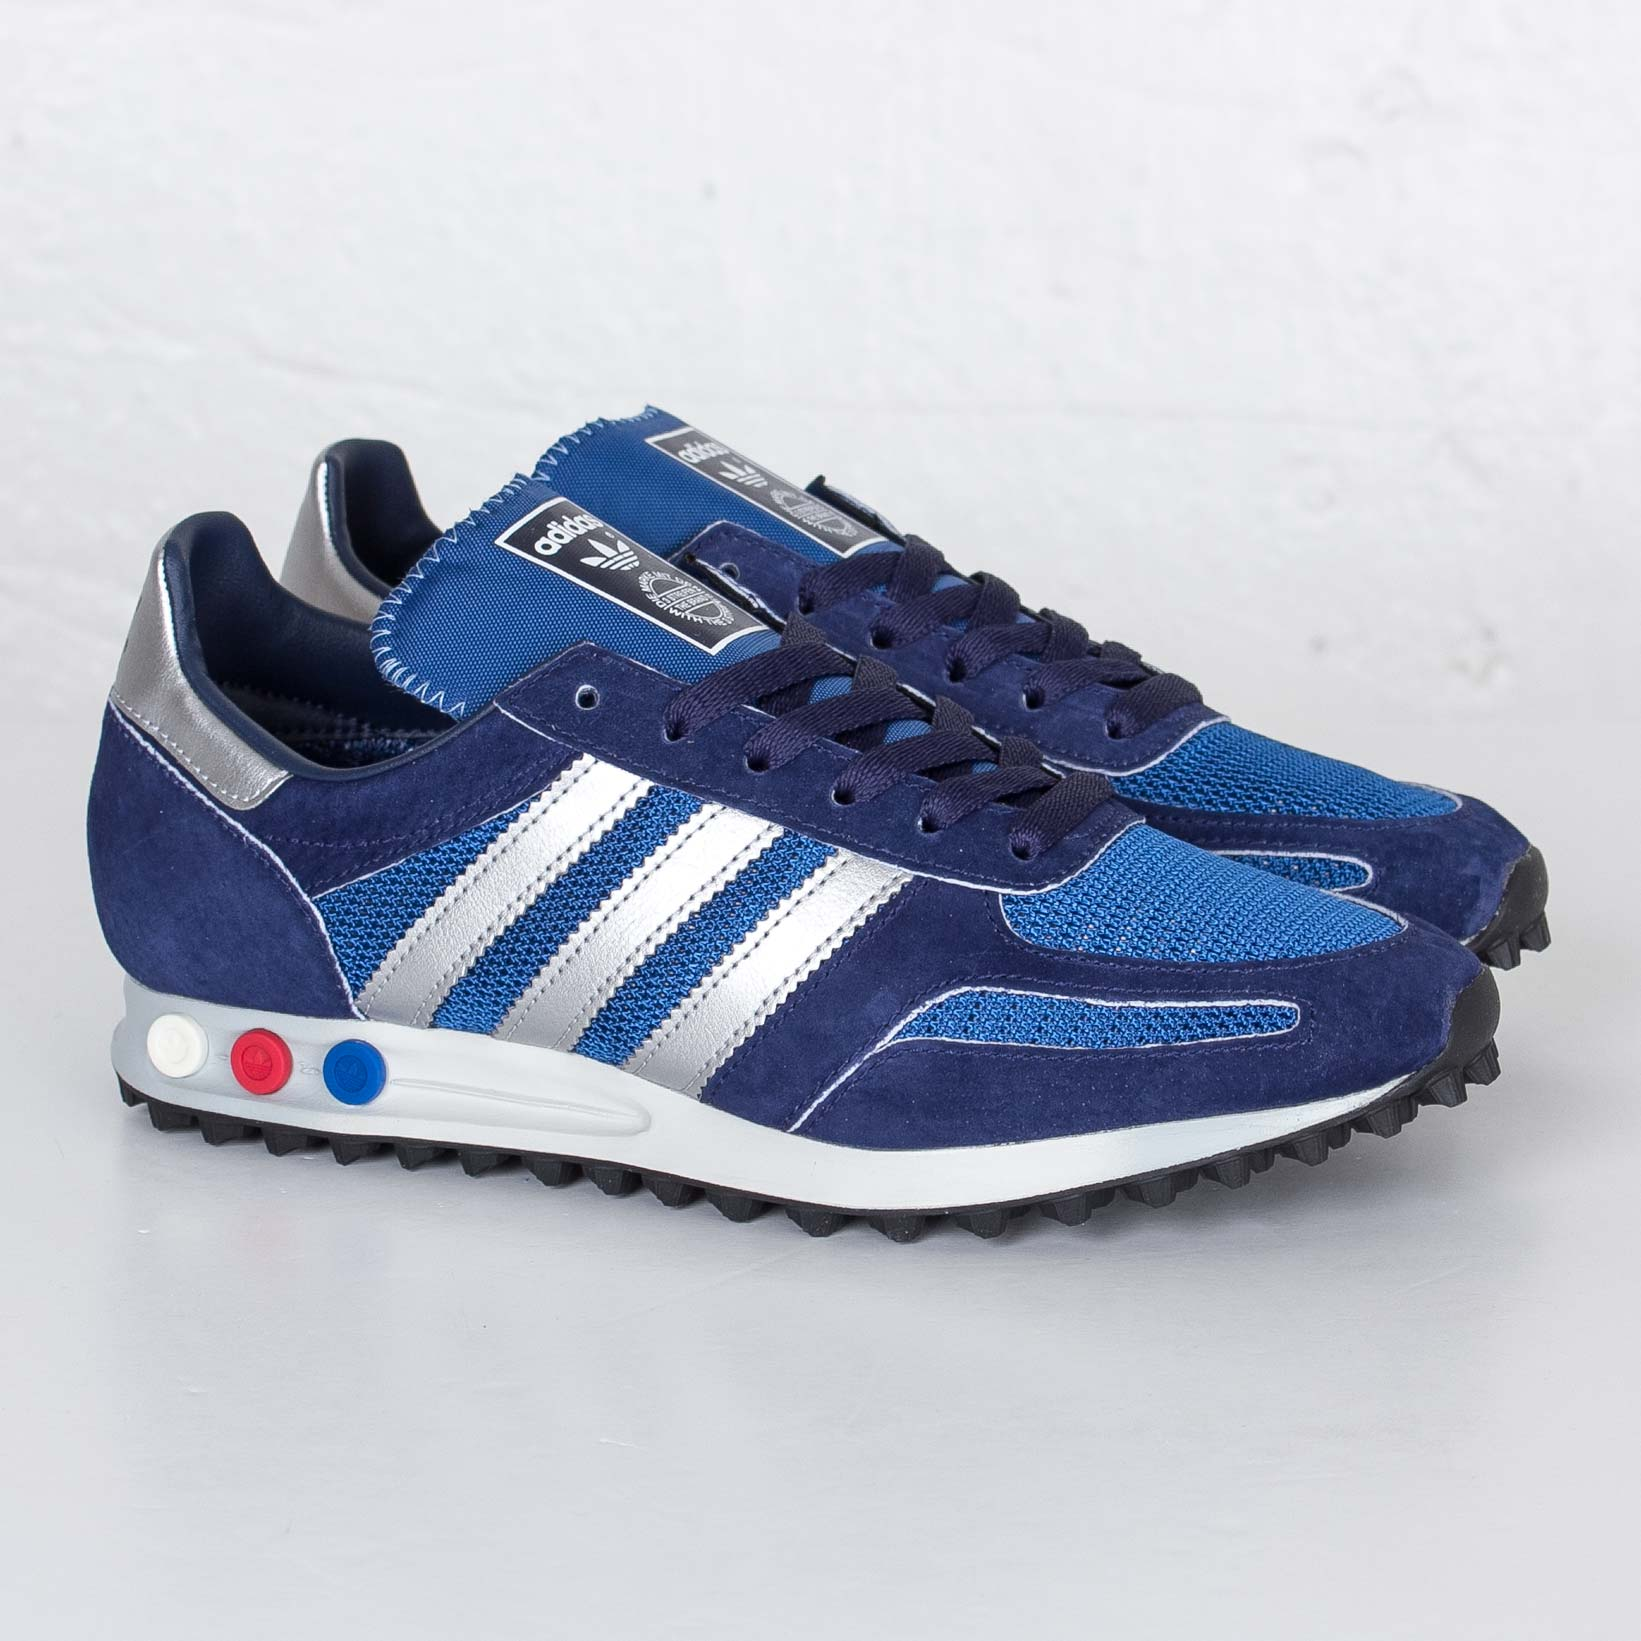 adidas LA Trainer OG - Aq4930 - SNS | sneakers & streetwear online ...